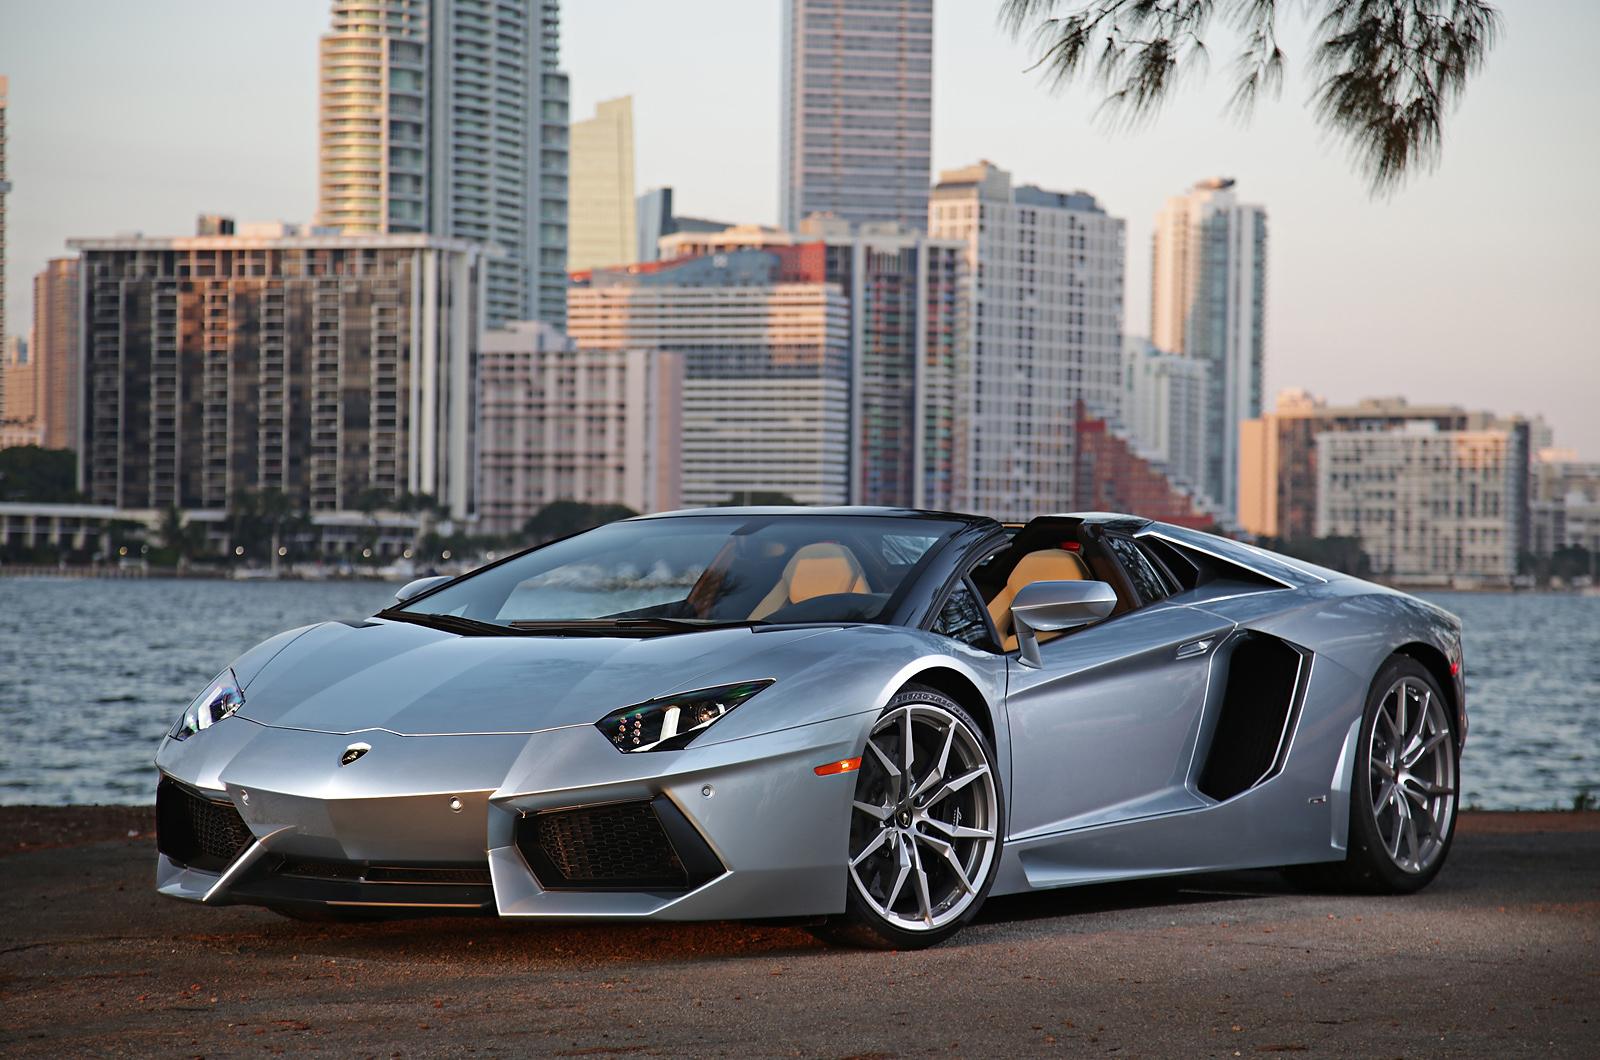 Lamborghini Aventador Transformers 4